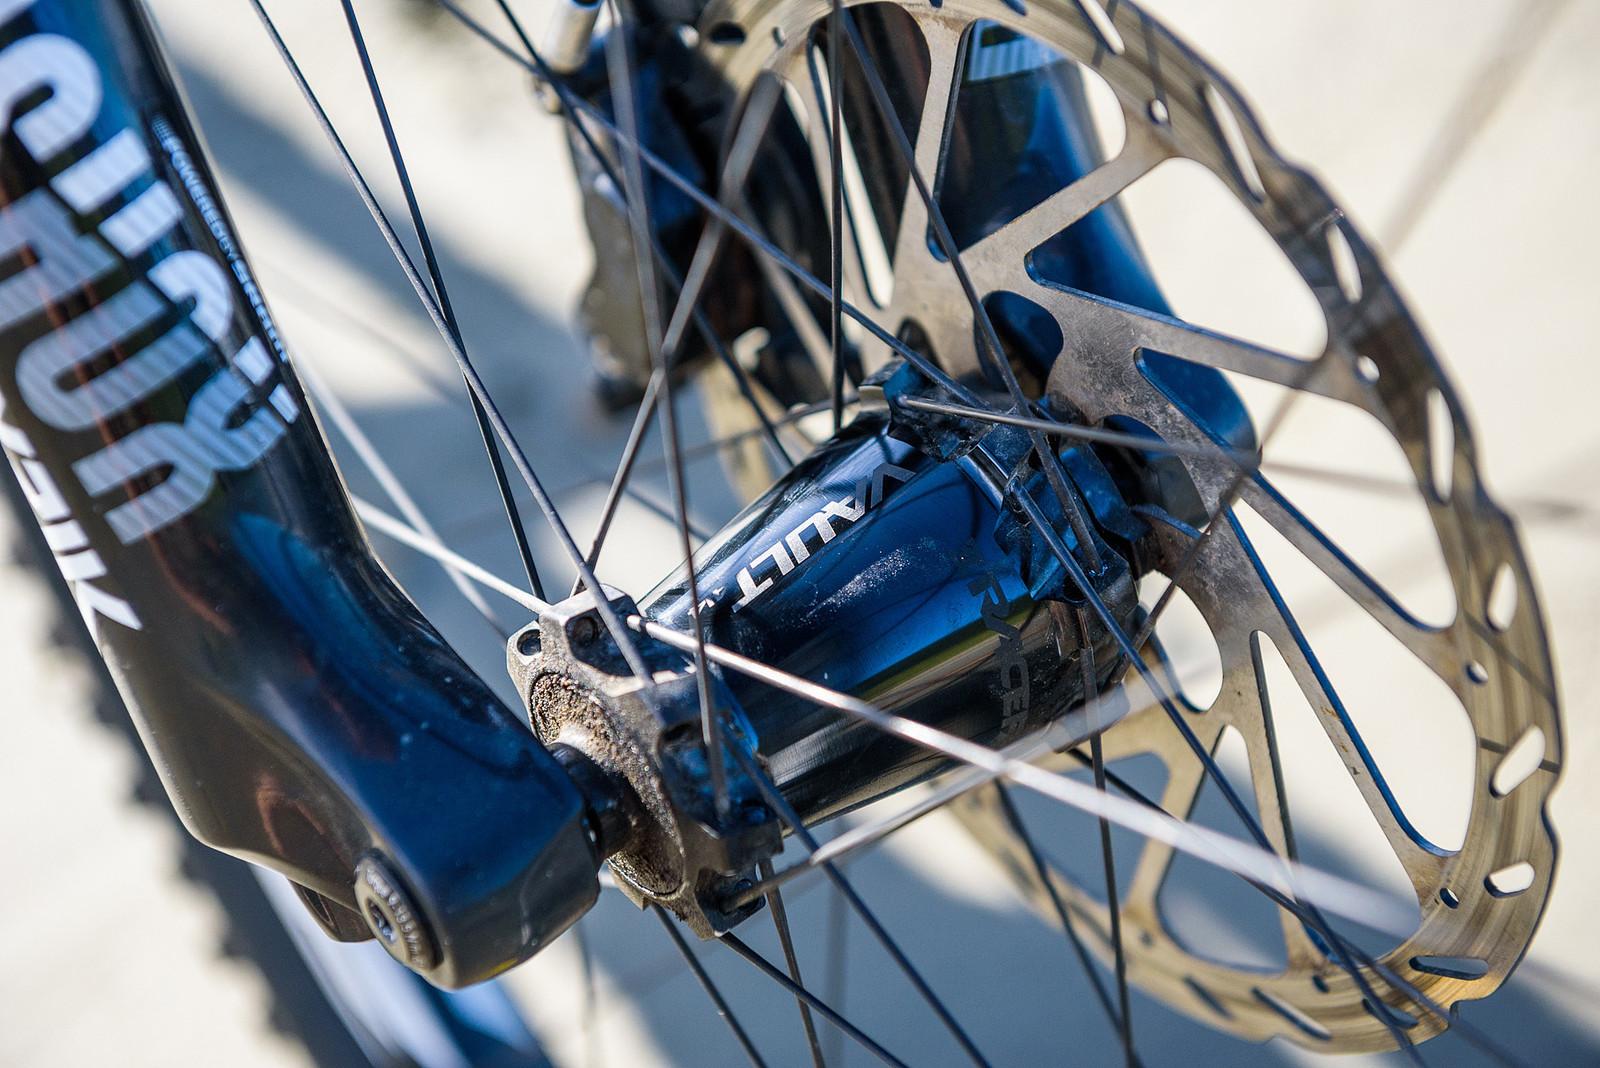 Race Face Wheels - Keegan Wright's Prototype Devinci 29er Enduro Machine - Mountain Biking Pictures - Vital MTB